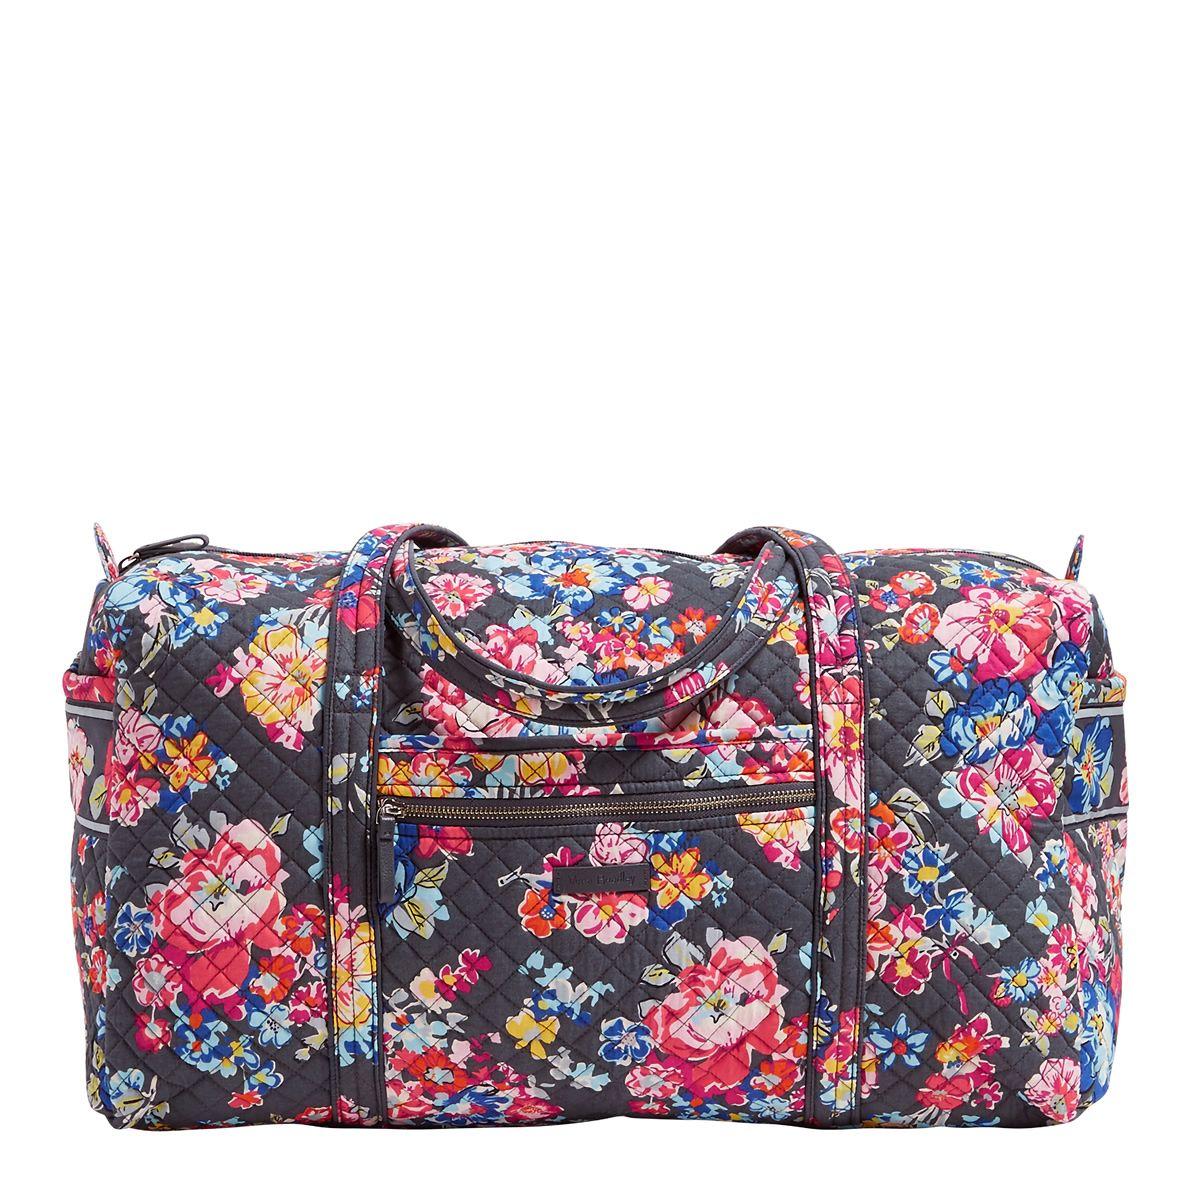 5618833e79 Vera Bradley Handbags - Macy s